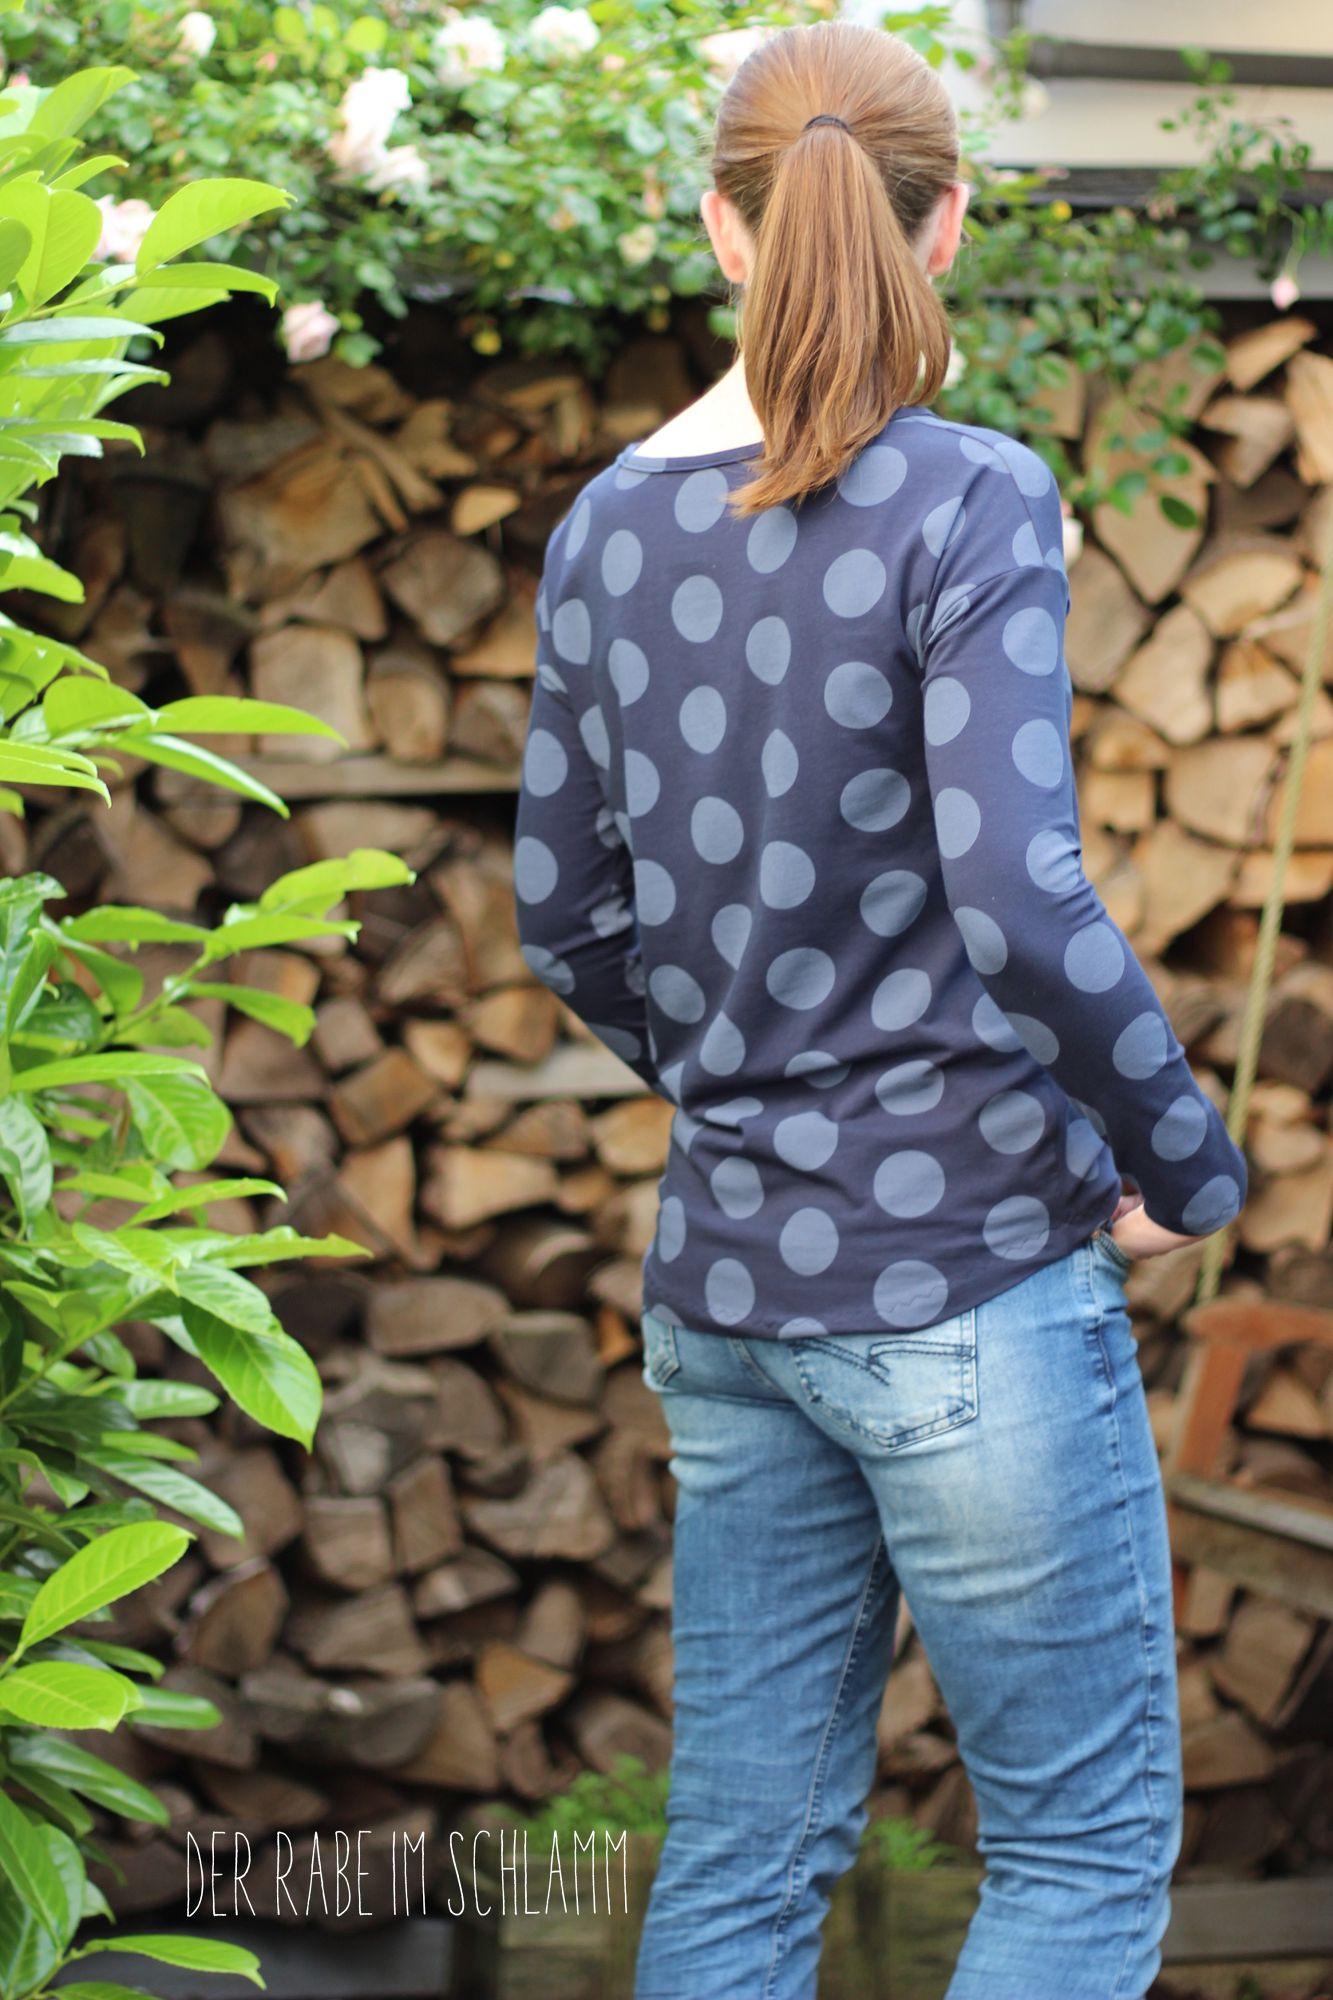 Der Rabe im Schlamm, Shirt, Nähen, Schnittmuster, Damen, Big Dots